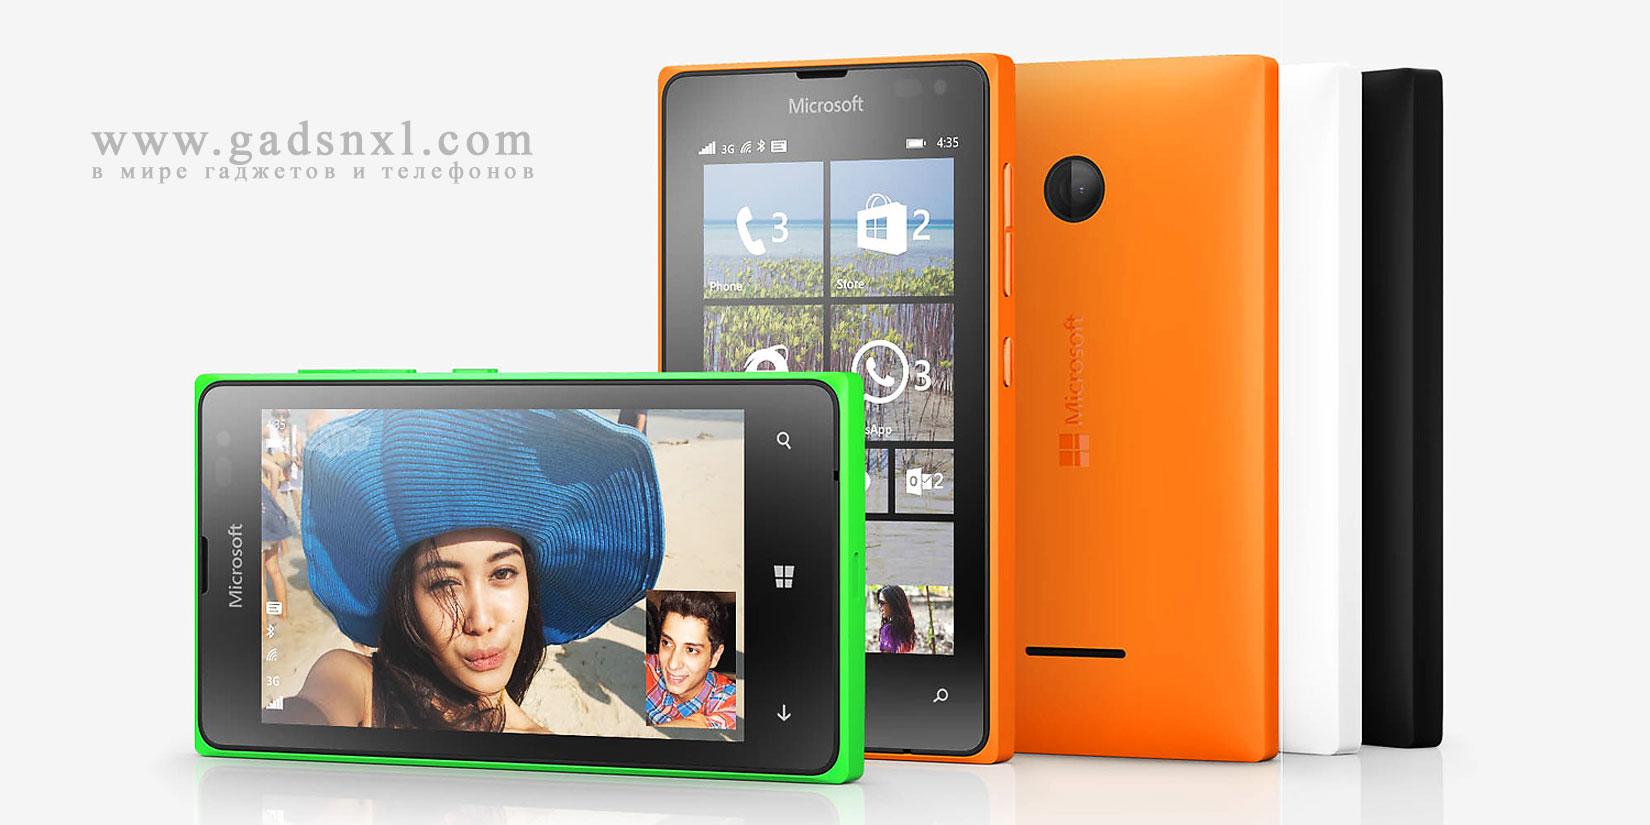 Новинка Microsoft — lumia 435